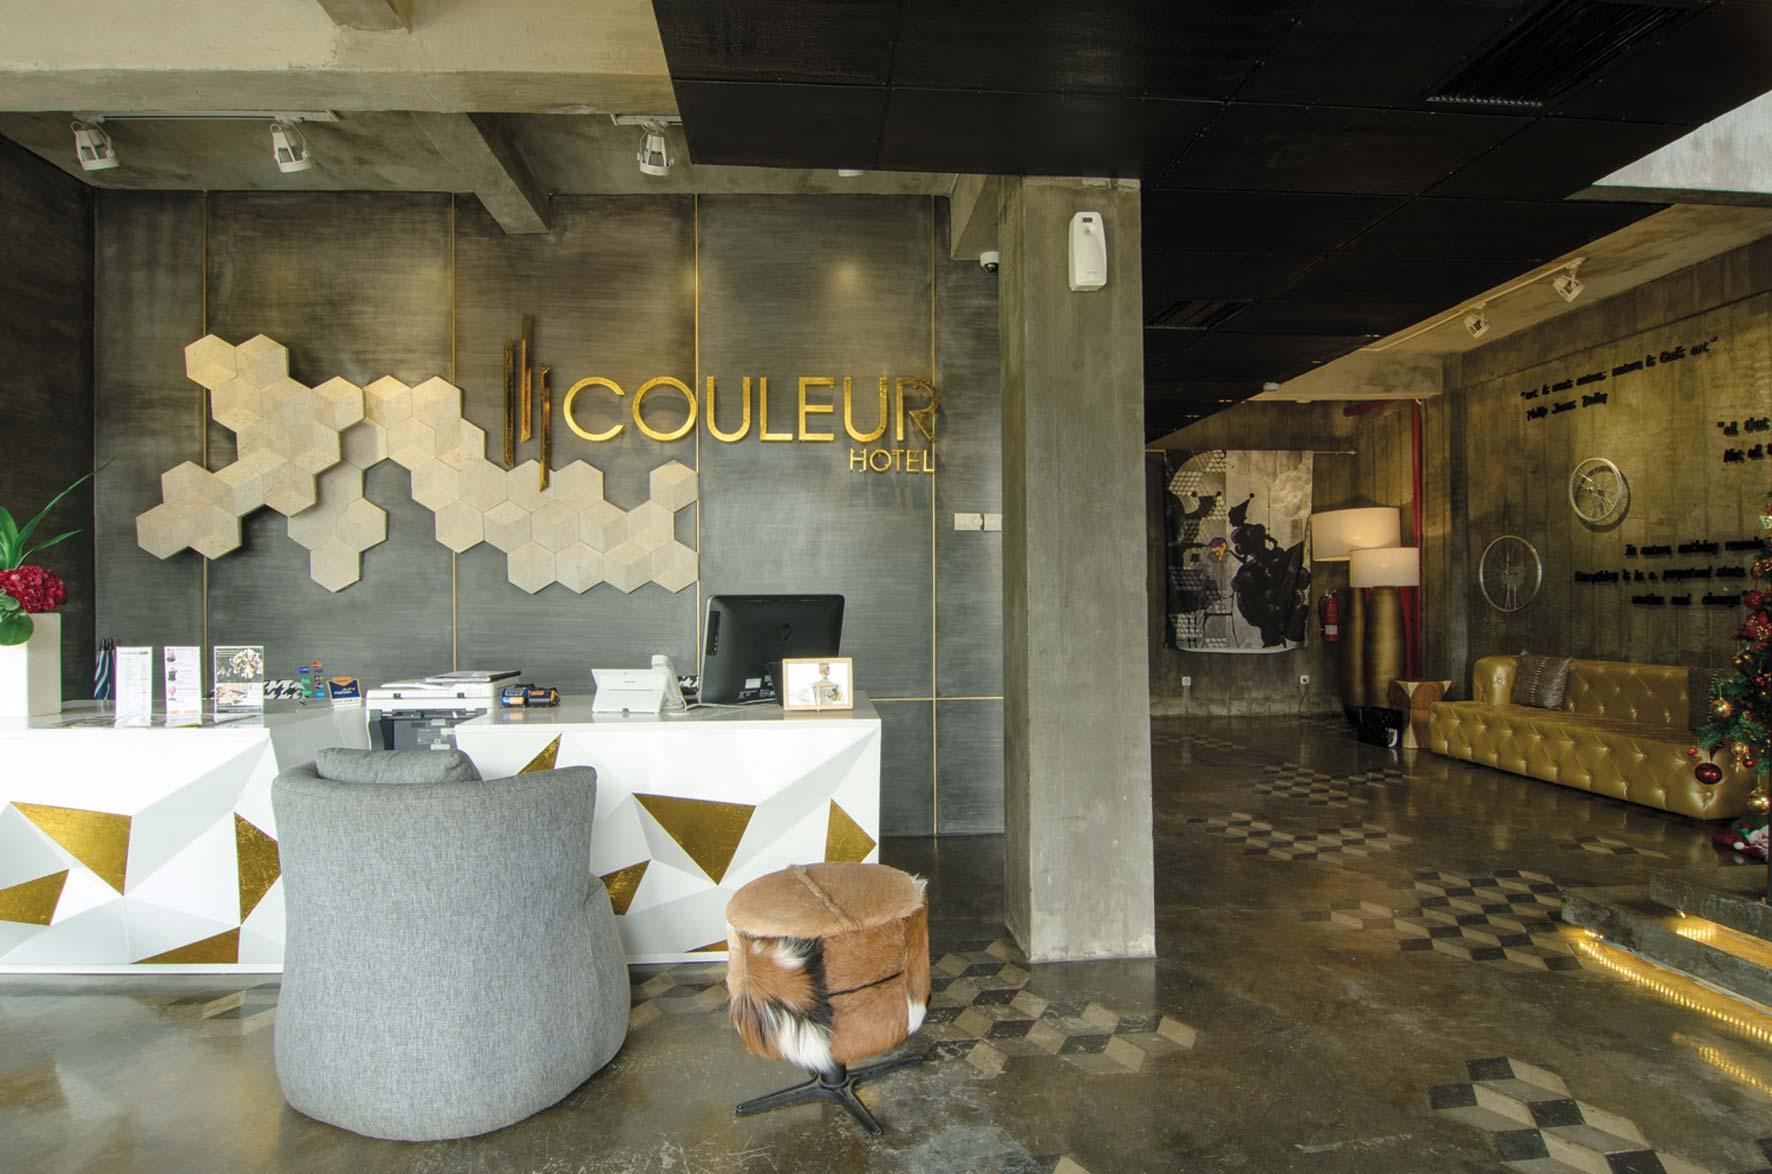 Lobi hotel gaya industrial